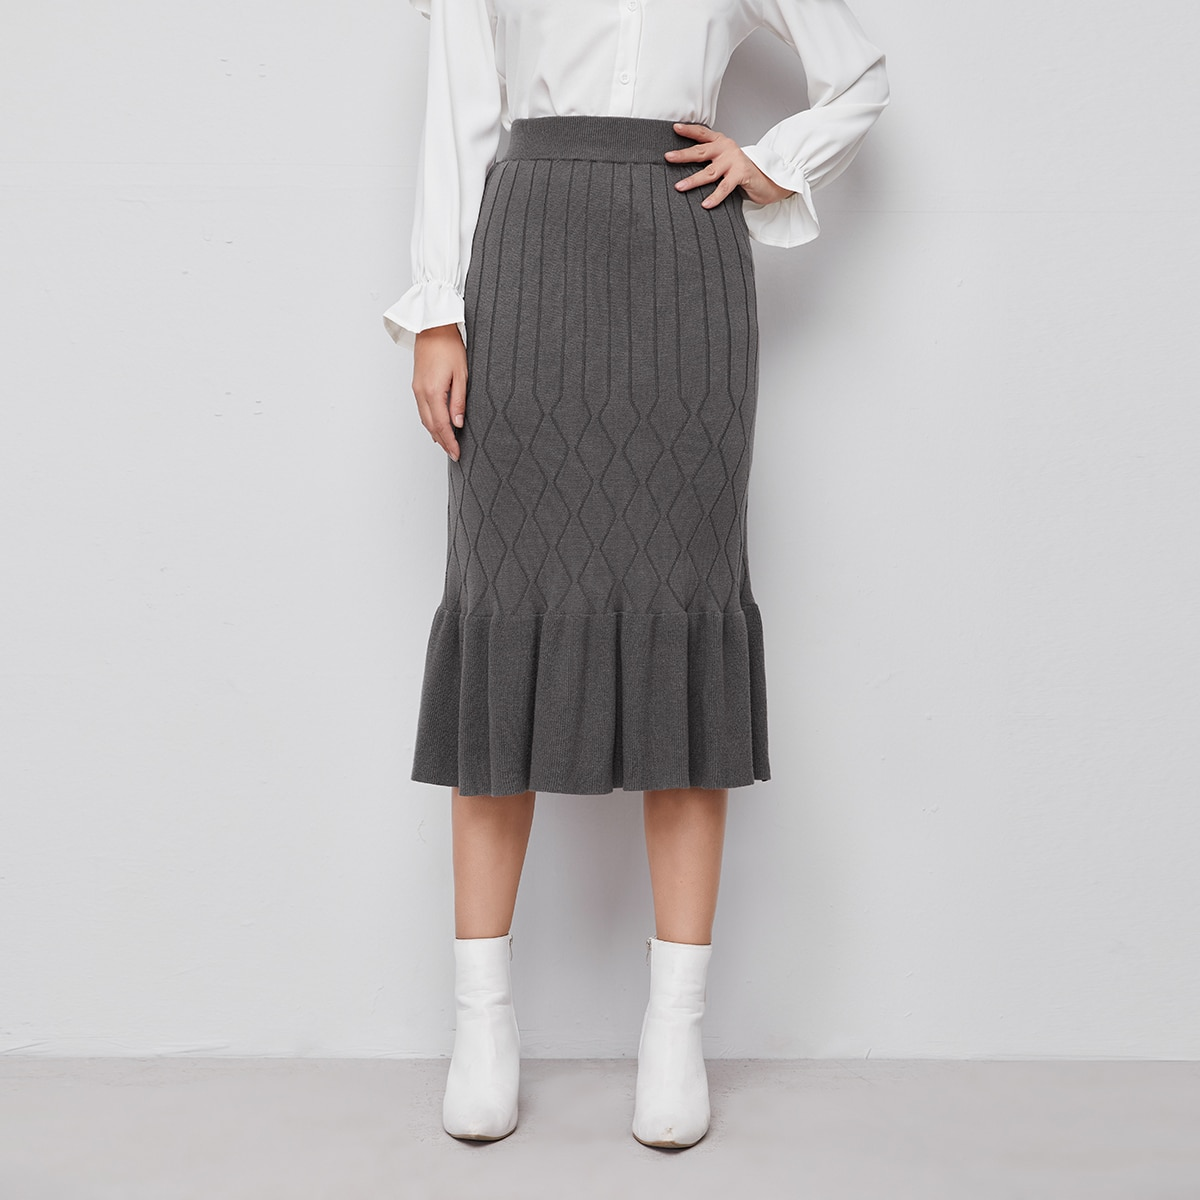 Ruffle Hem Solid Knit Skirt